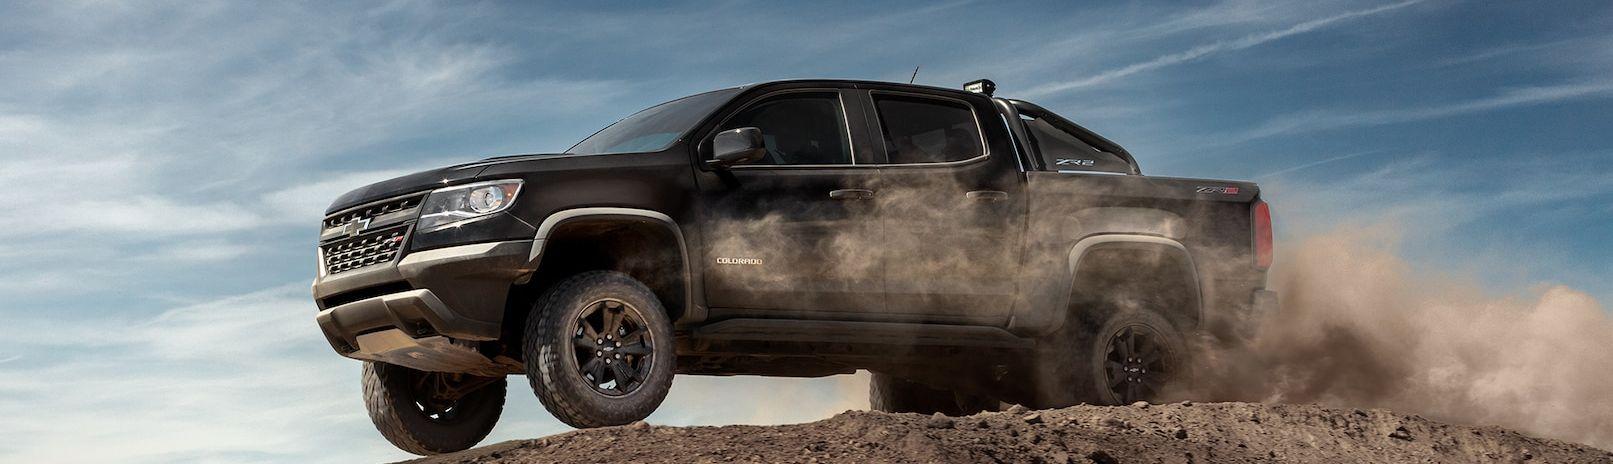 2019 Chevrolet Colorado Leasing near Manassas, VA